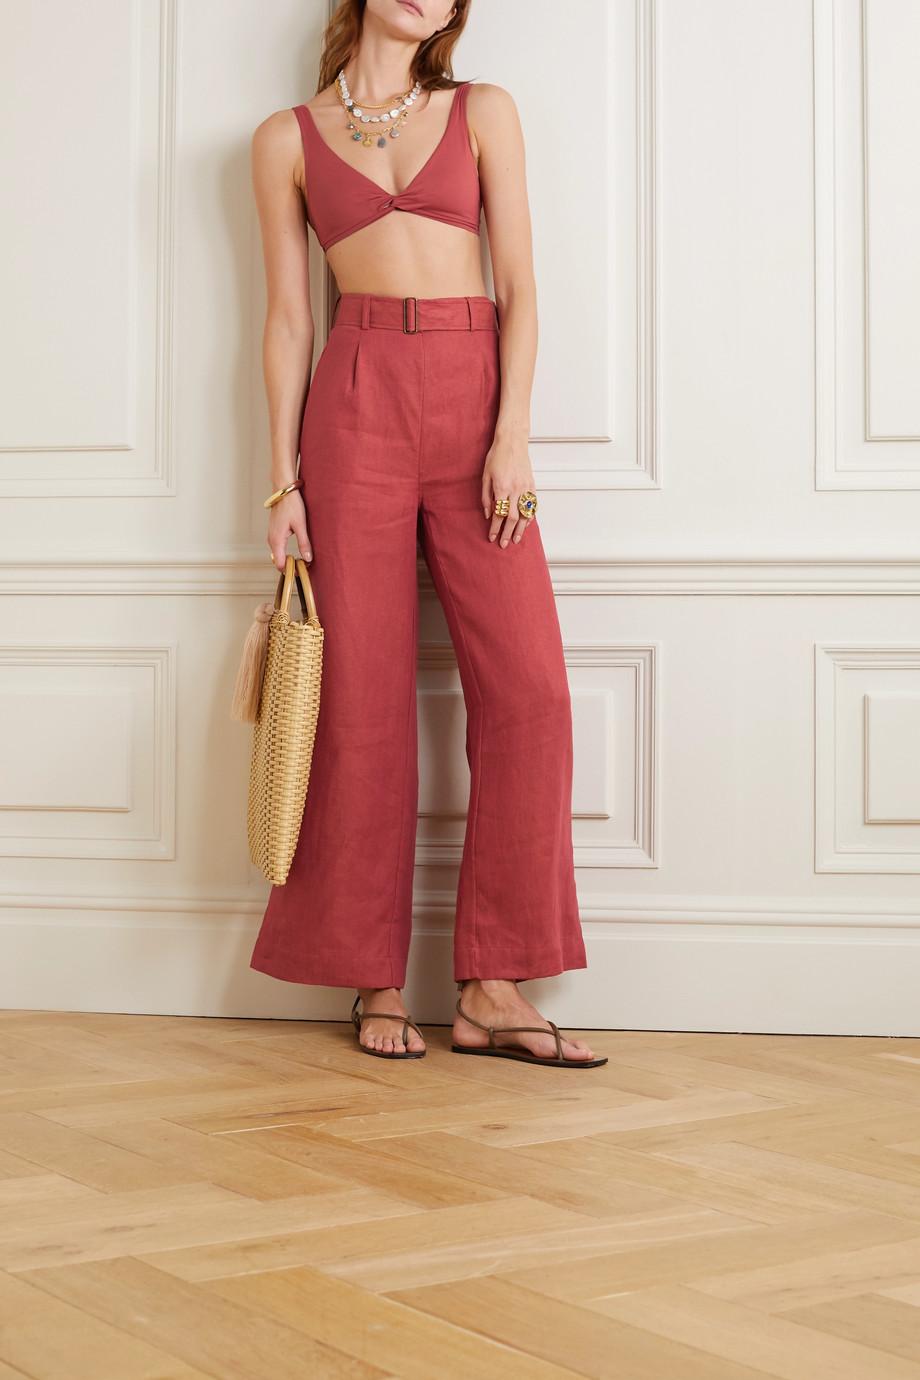 BONDI BORN Belted linen wide-leg pants